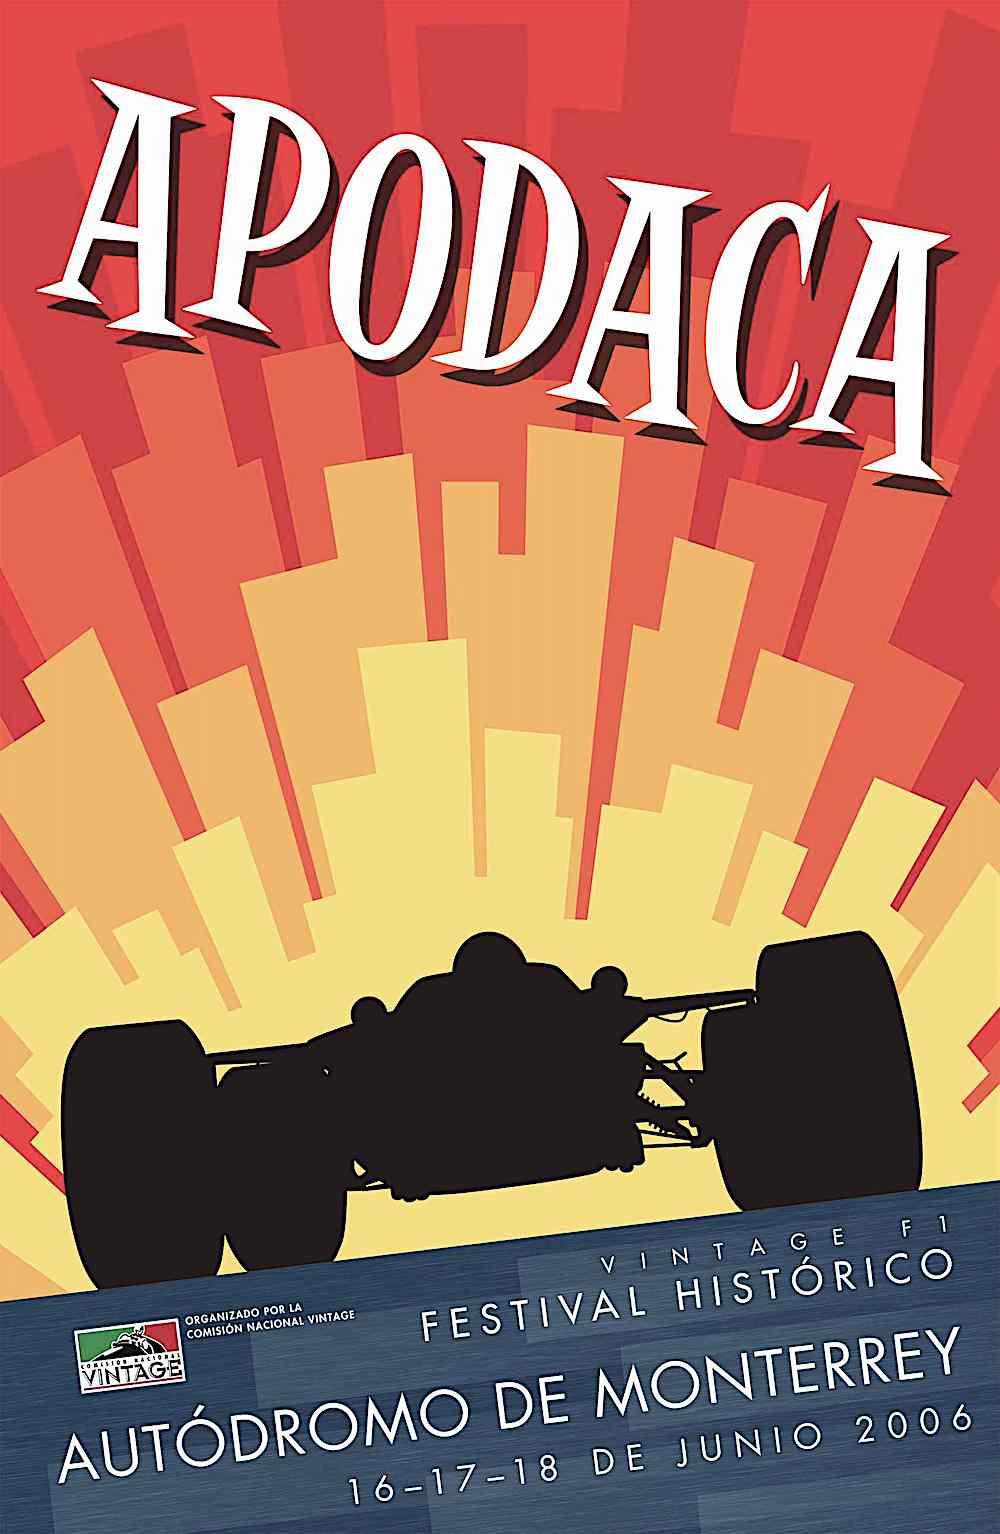 a 2006 John Bradley color poster in silhouette, Apodaca